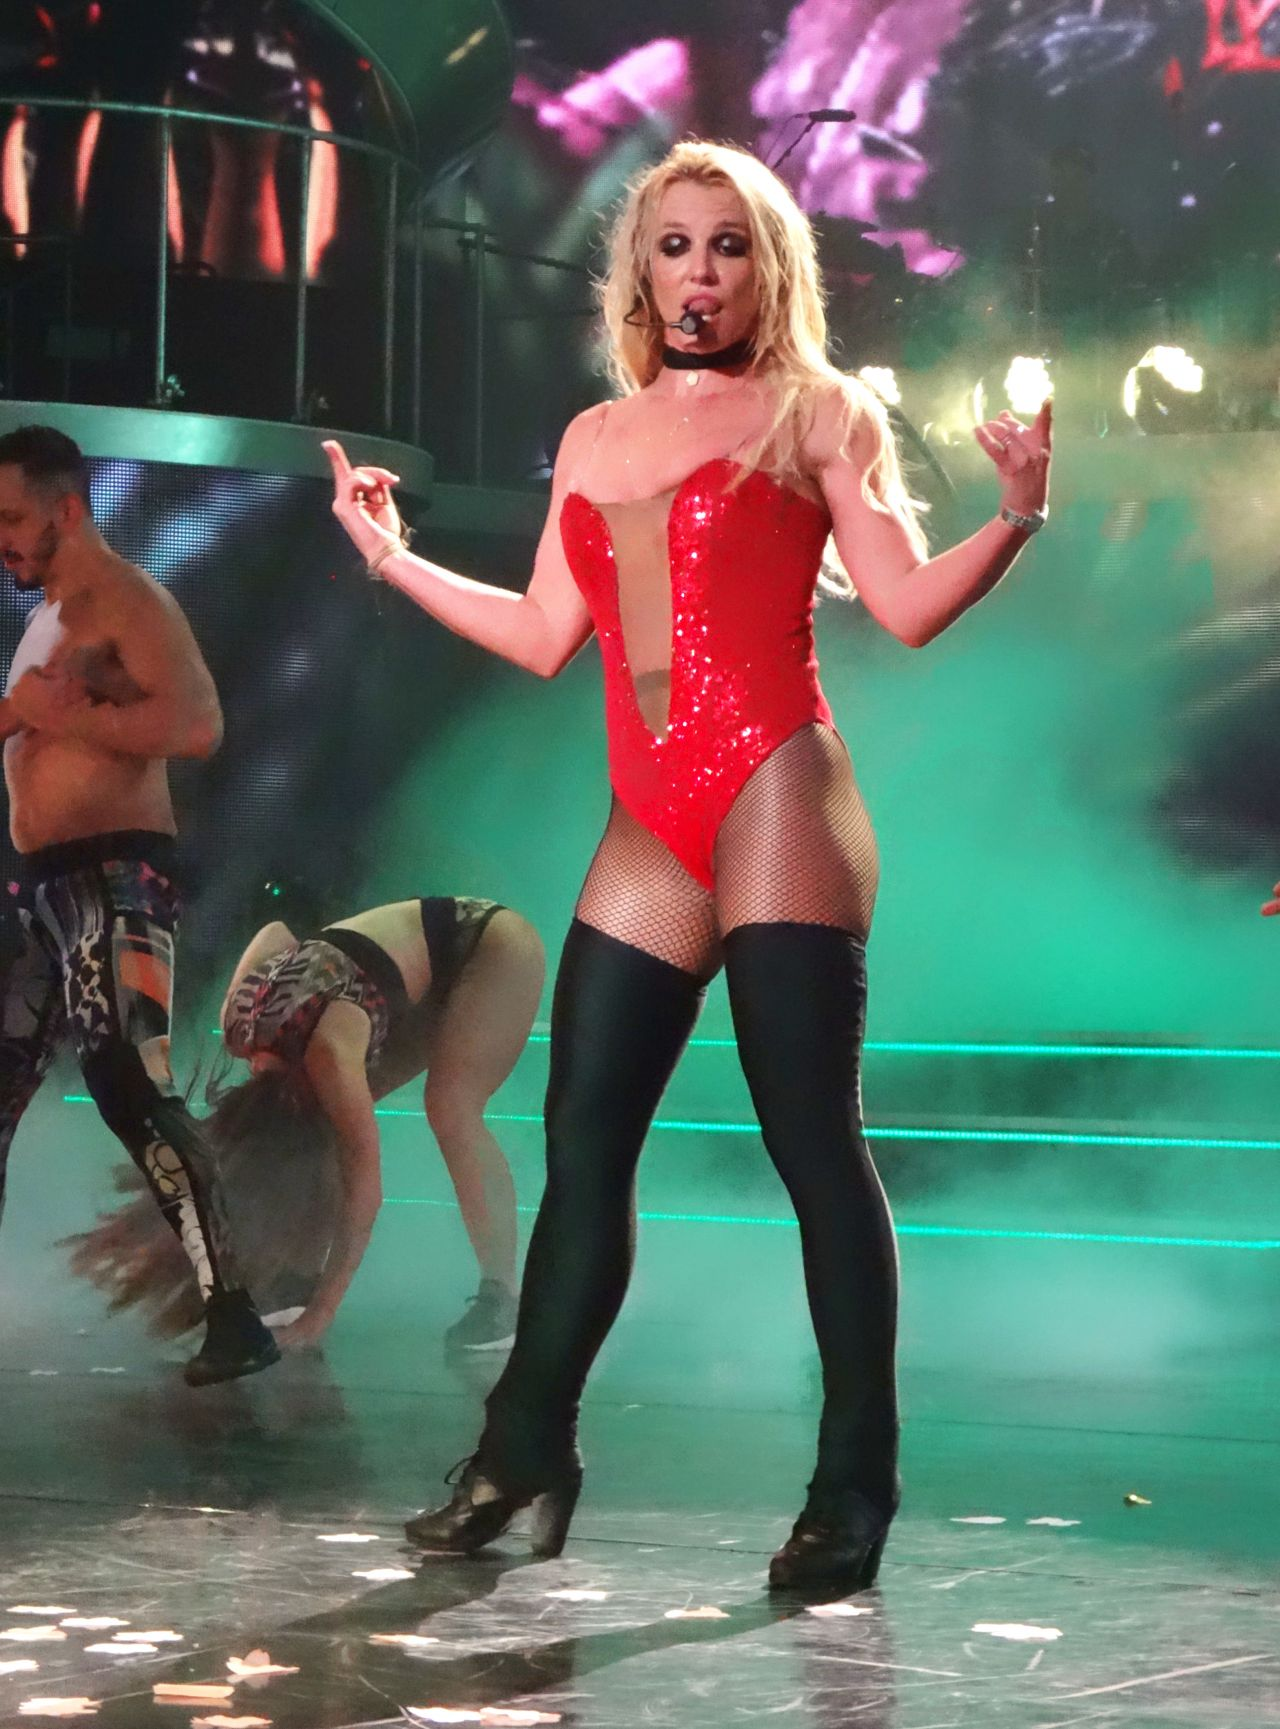 naked (63 photo), Hot Celebrity pics